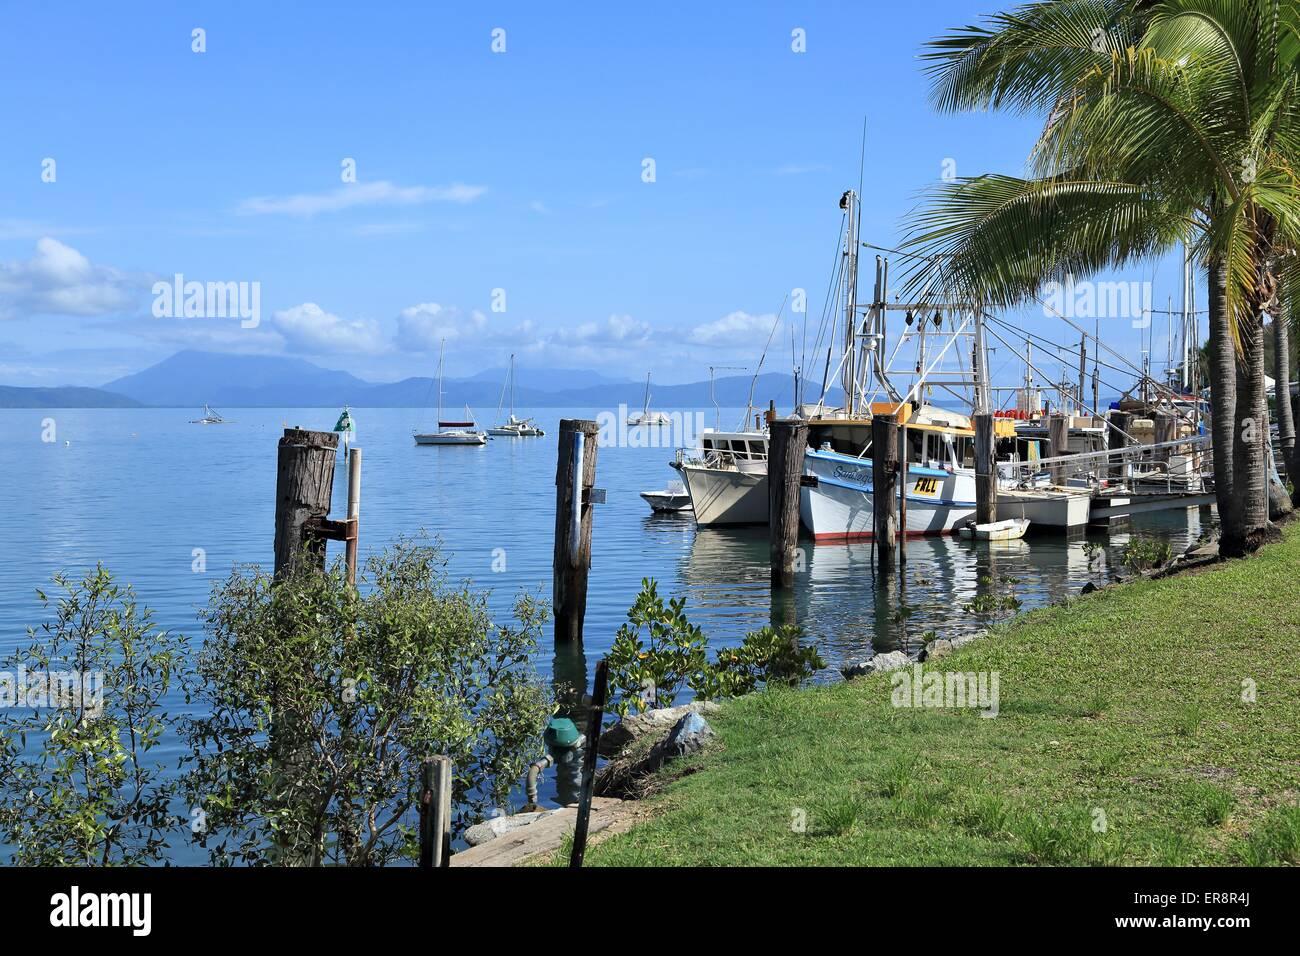 Beautiful reflections of boats moored at the Port Douglas Marina, Port Douglas, Queensland, Australia - Stock Image